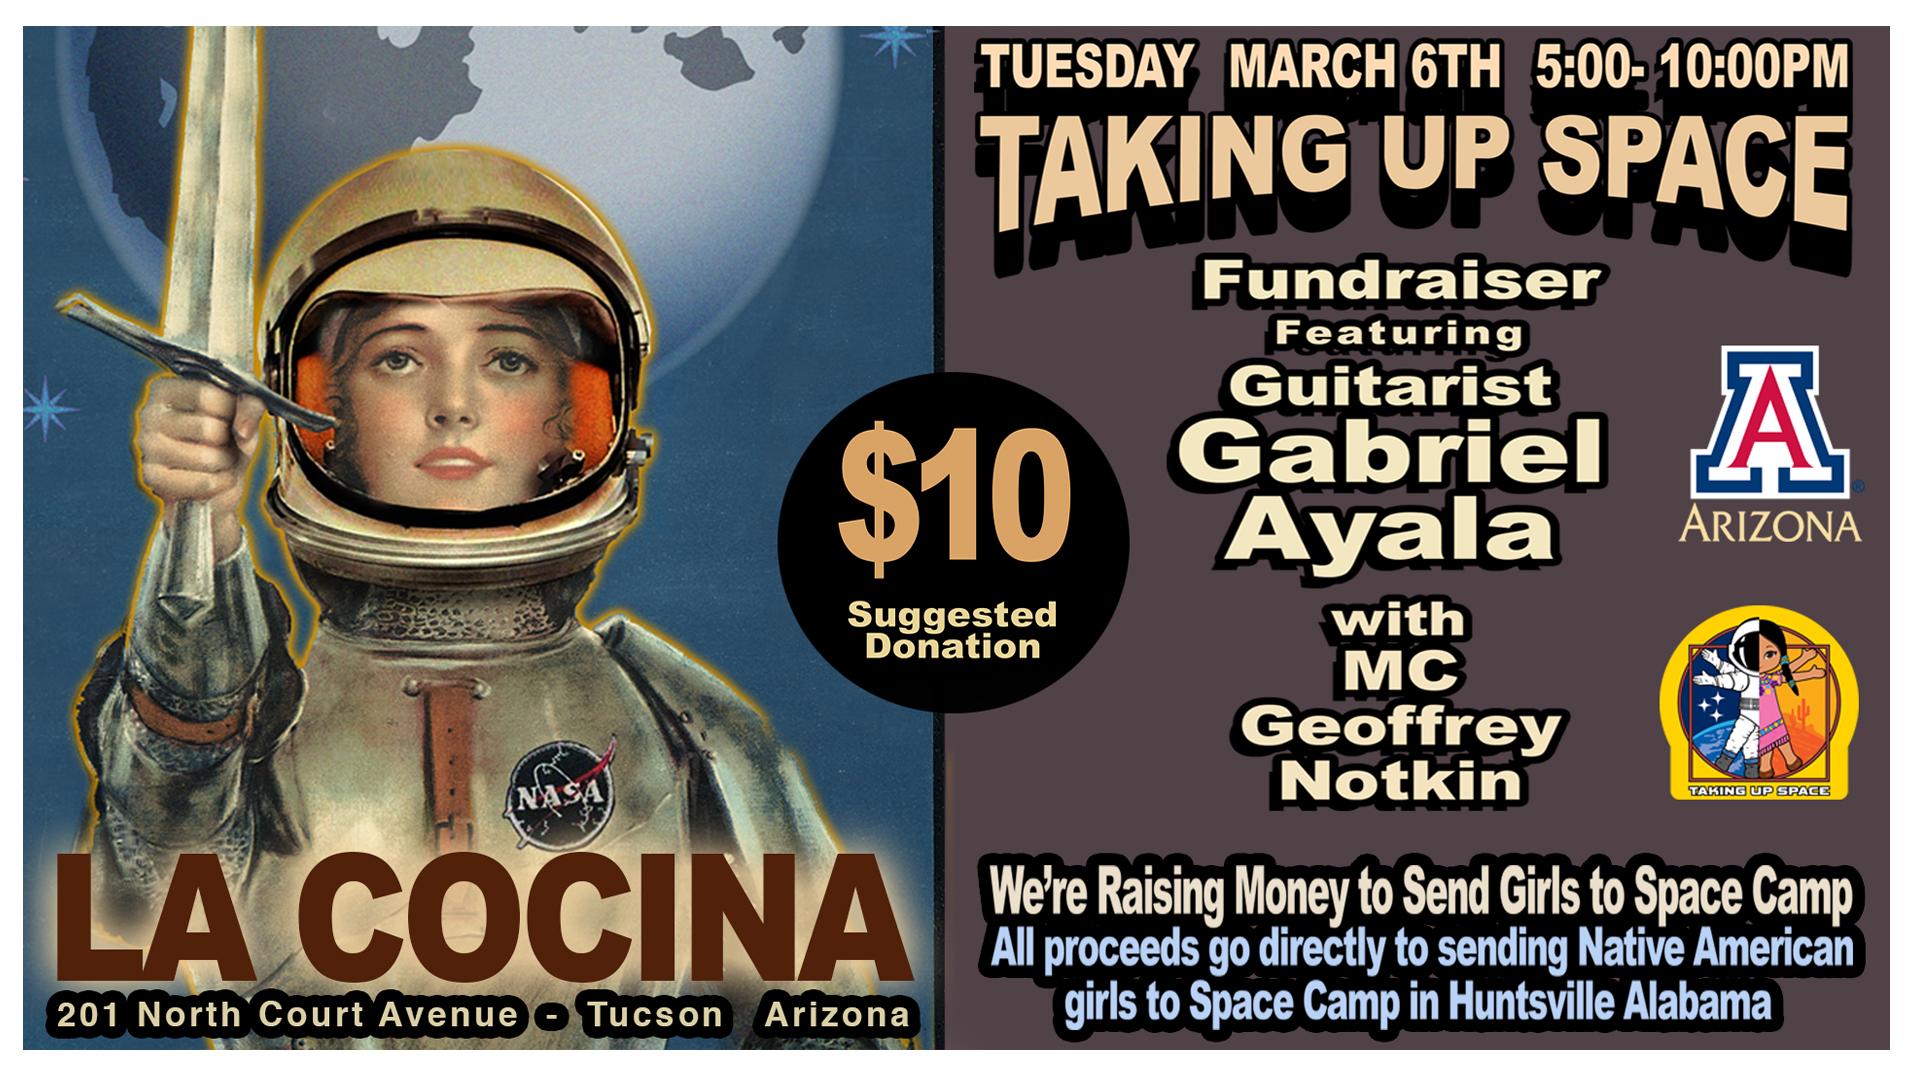 Fundraiser featuring Guitarist Gabriel Ayala!